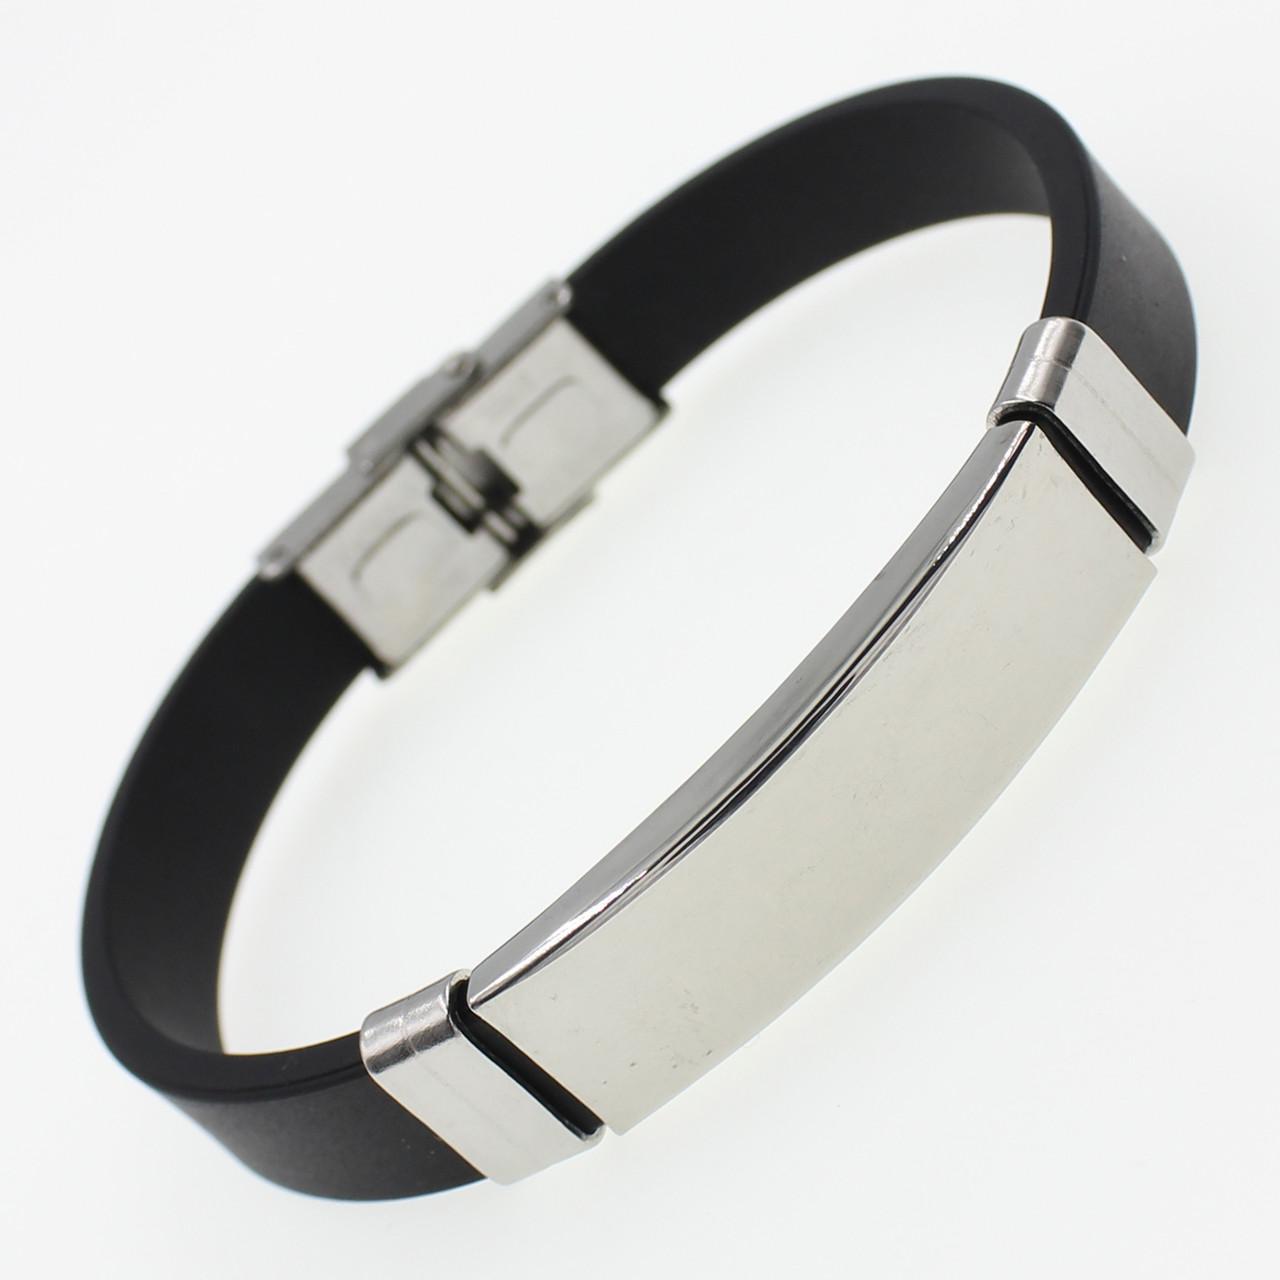 Мужской плетеный браслет с элементами Stainless Steel